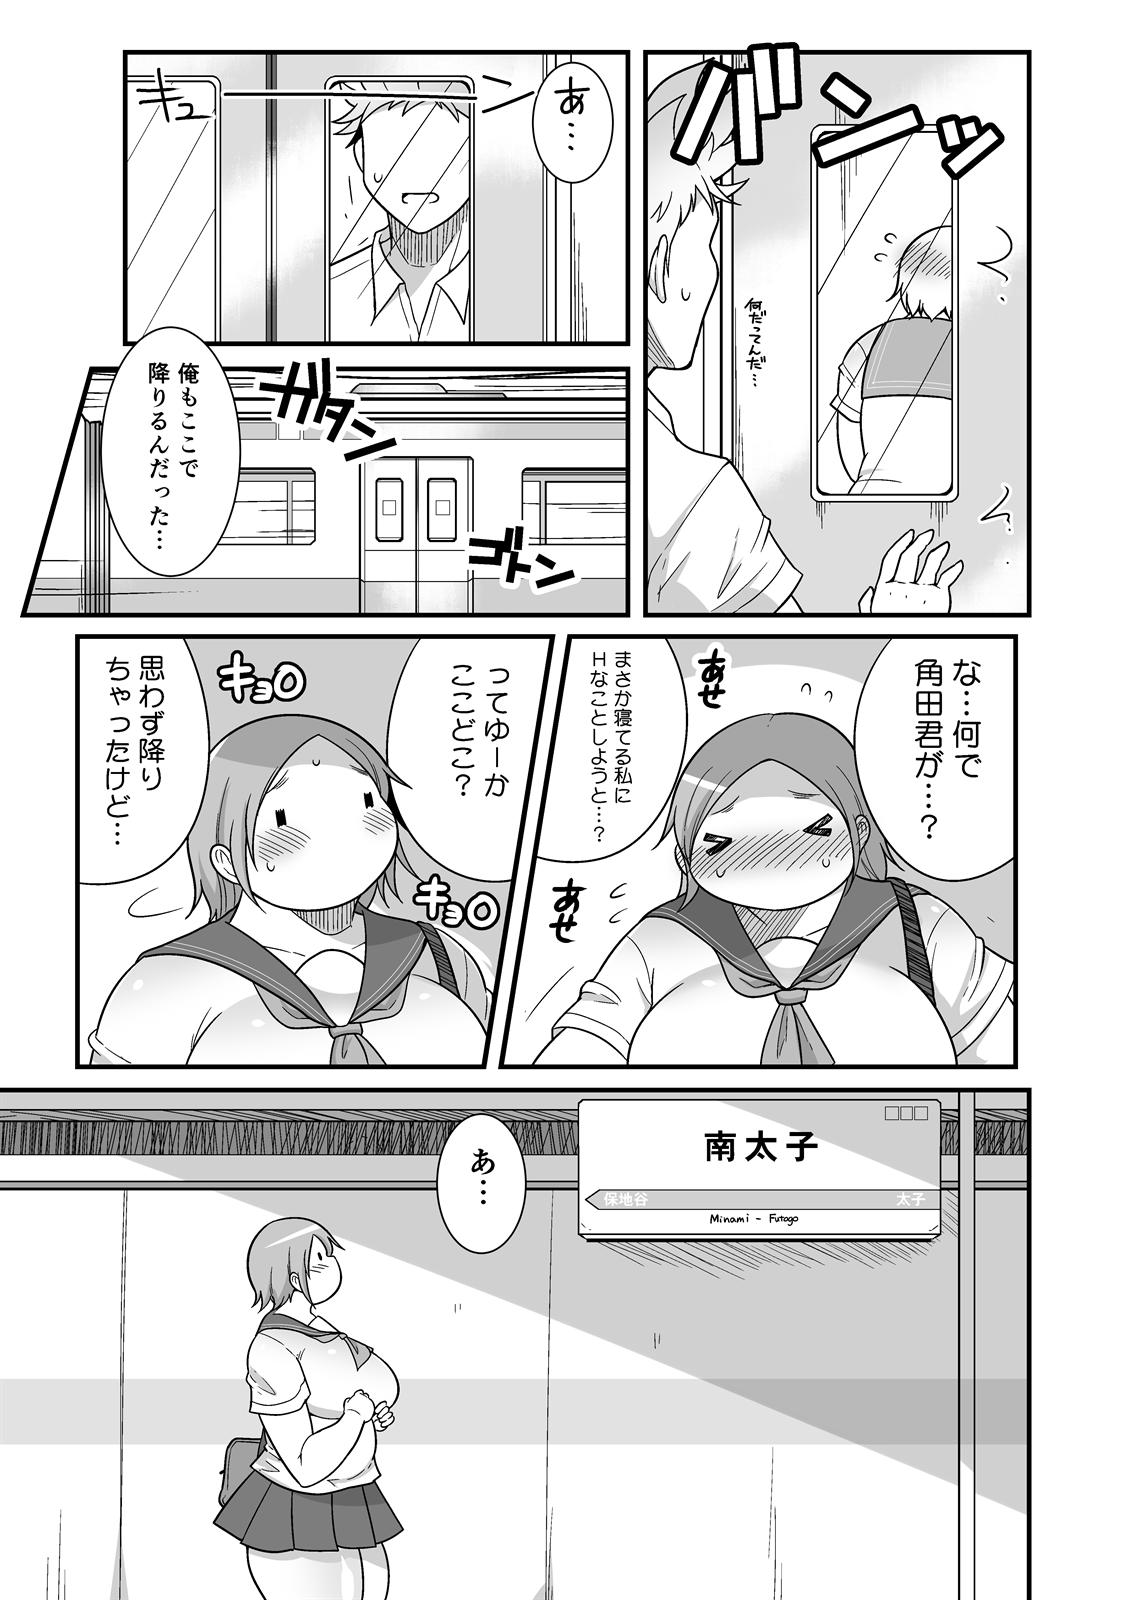 Pocha OnaPet Honda-san Jitoku Hen + Omake 21